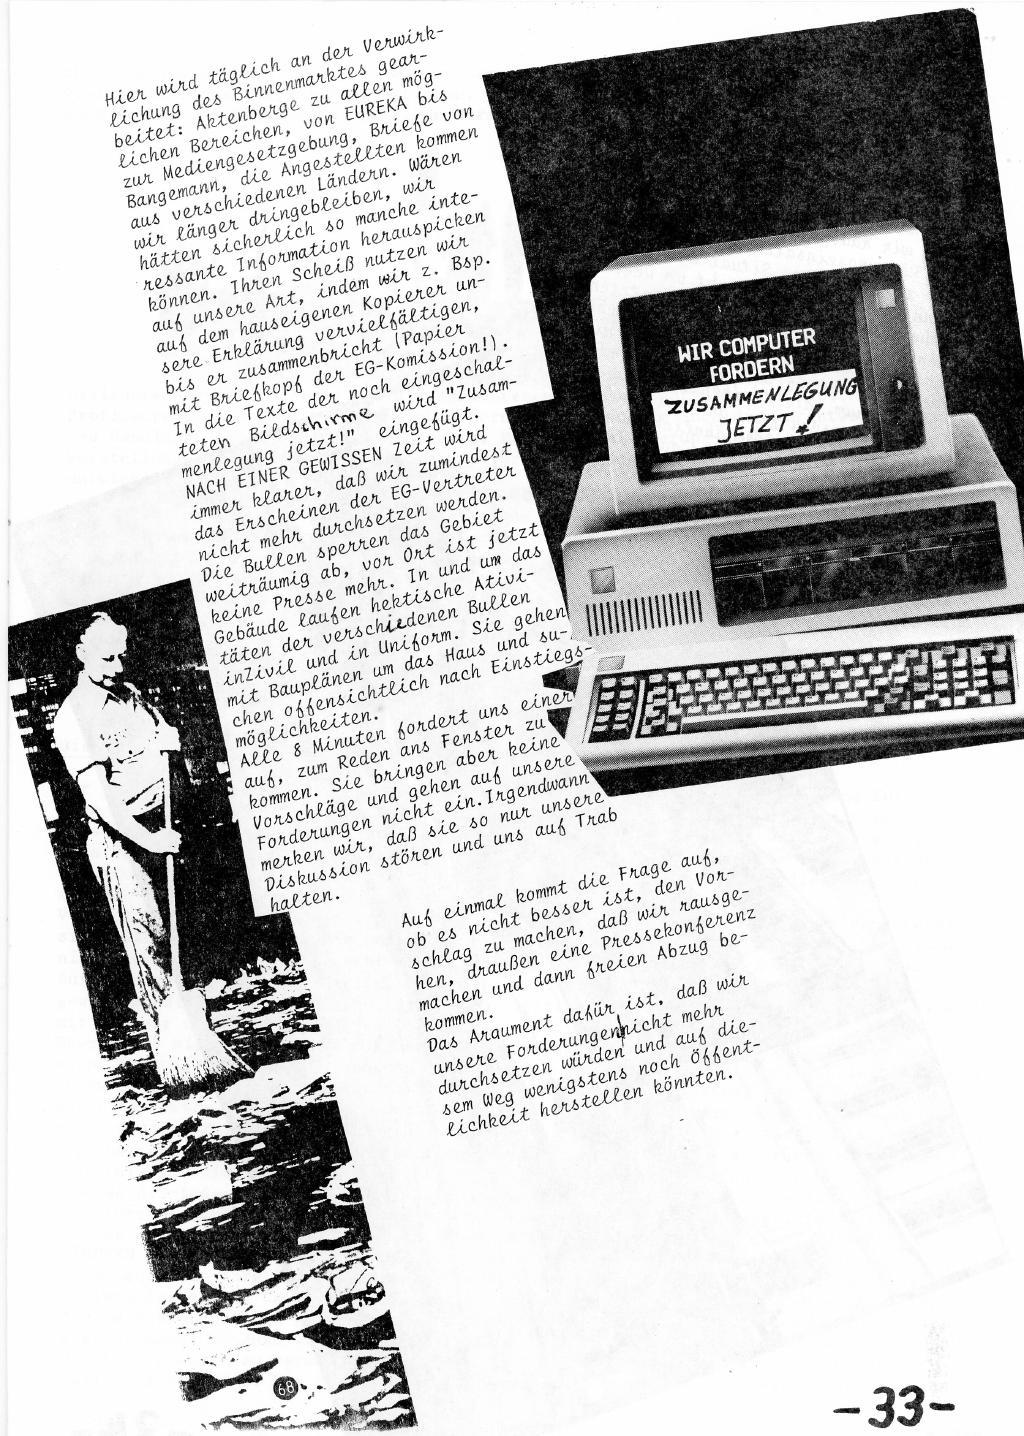 Belgien_Doku_Besetzung_EG_Kommission_1989_035